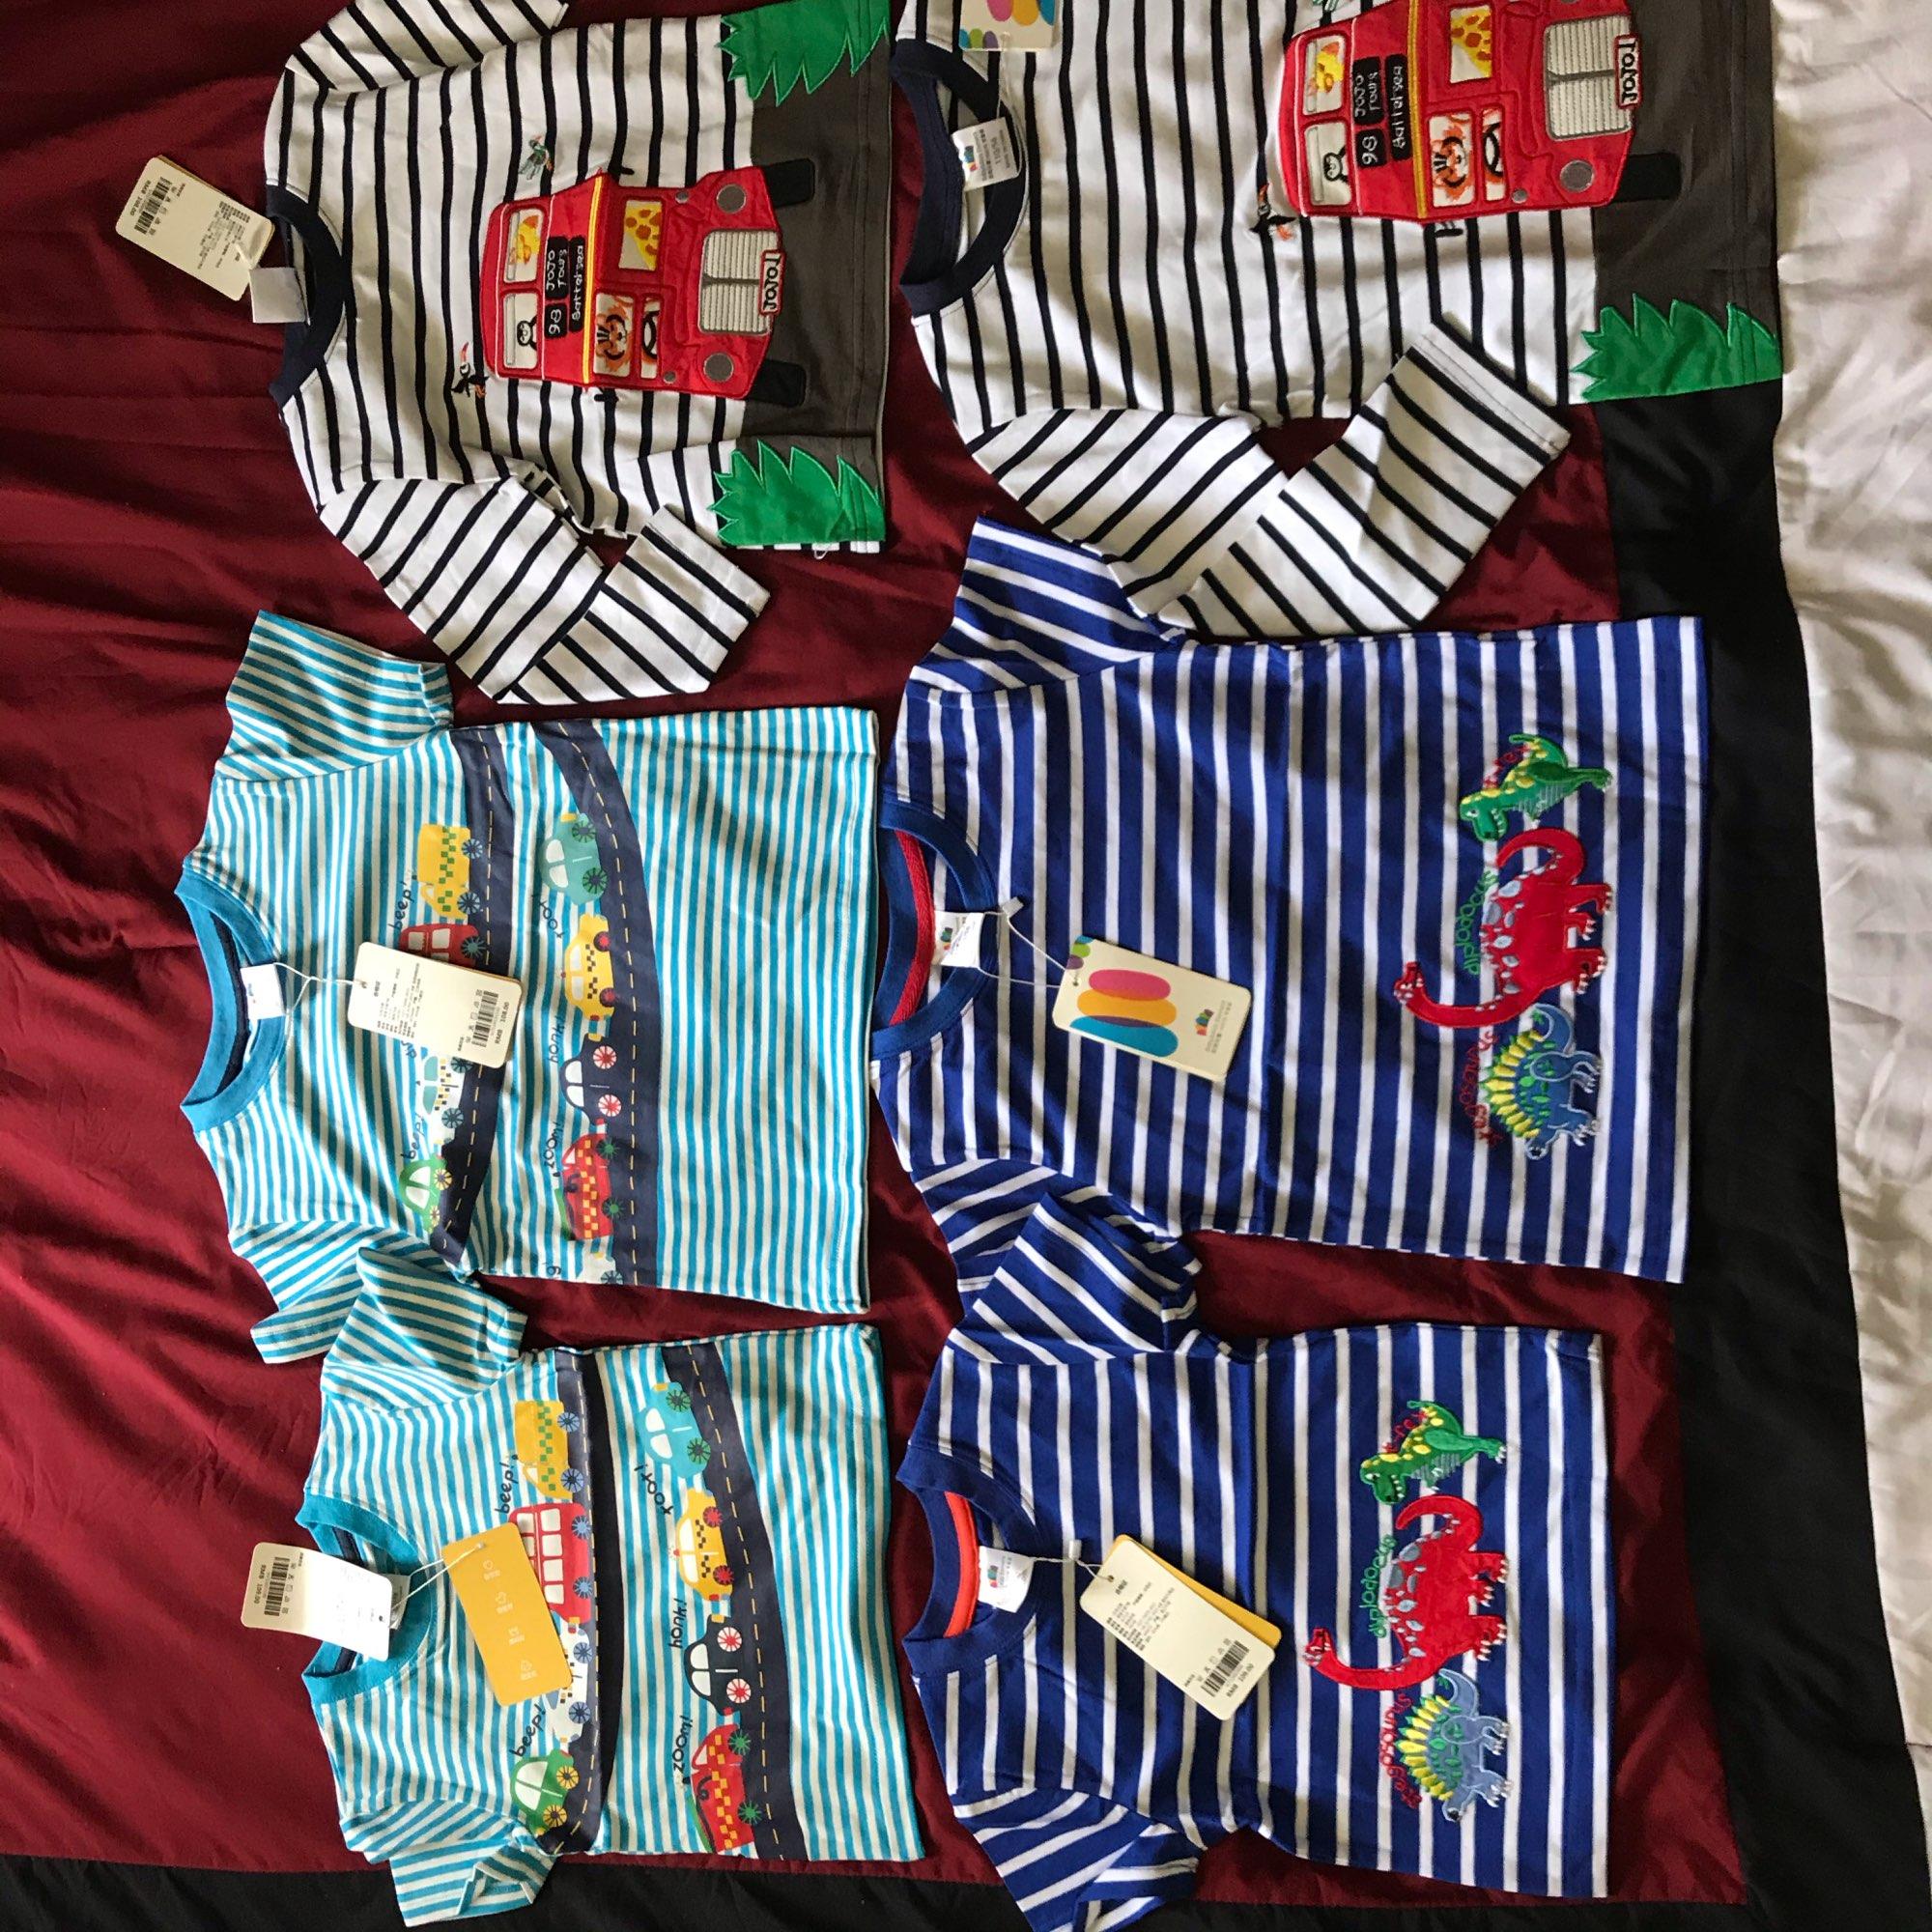 2021 Summer 2-10T Children'S Birthday Clothing Dinosaur Car Striped Print Short Sleeve Basic Tops Cartoon T Shirt For Kids Boy photo review